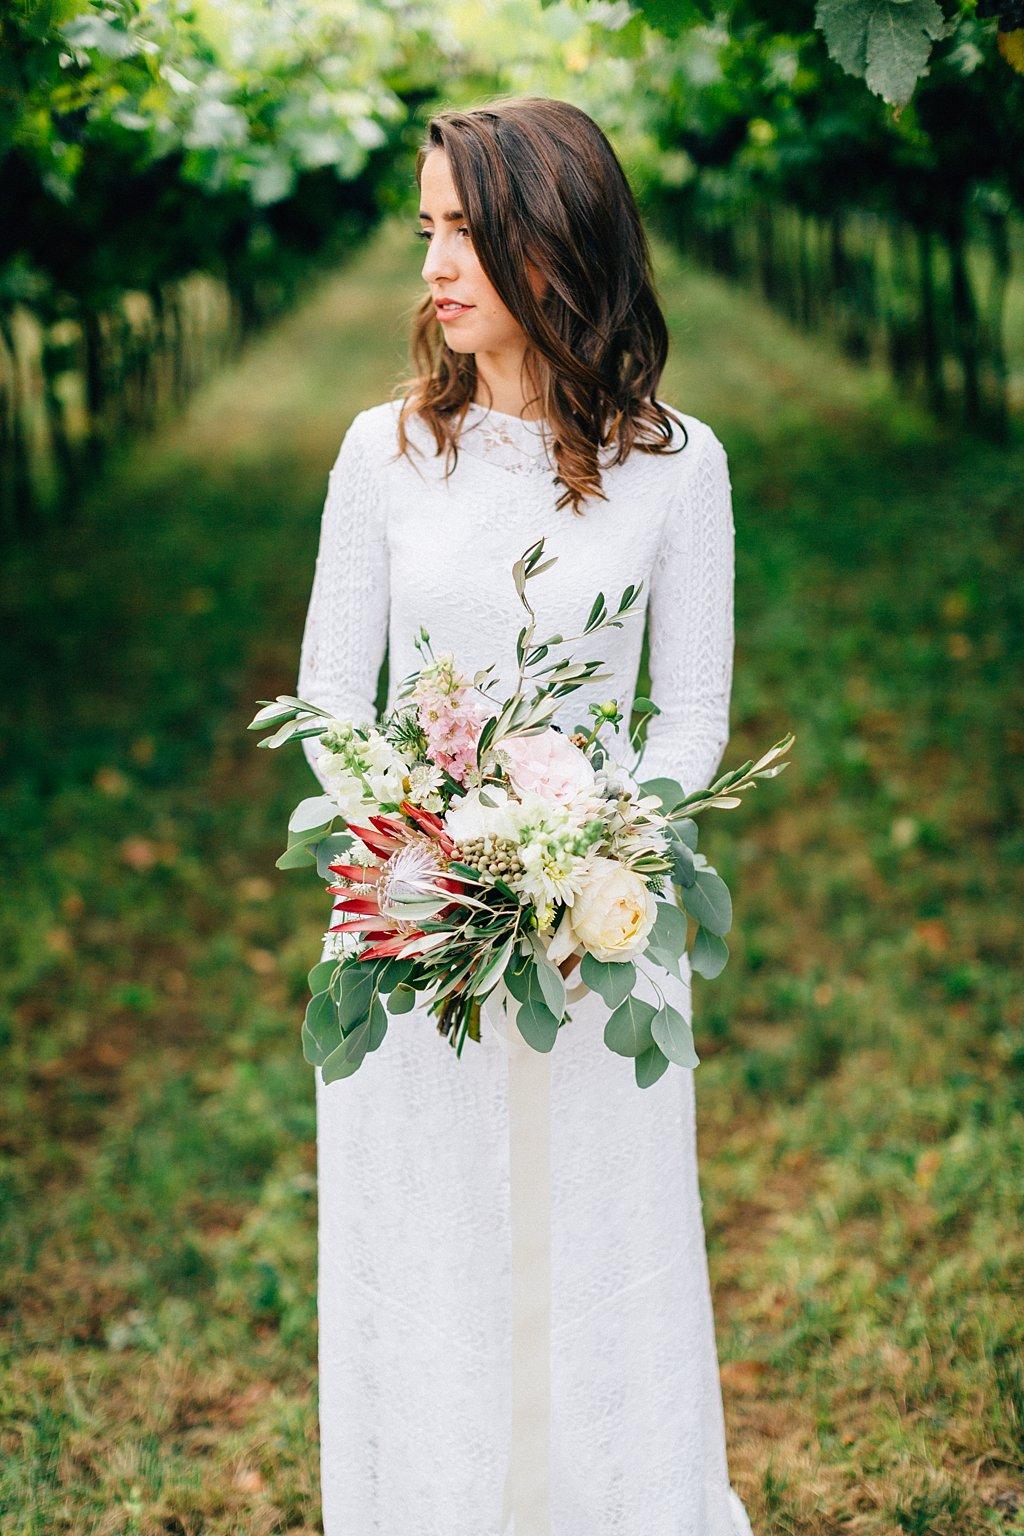 Brautstrauß mit Eukalyptus und Protea